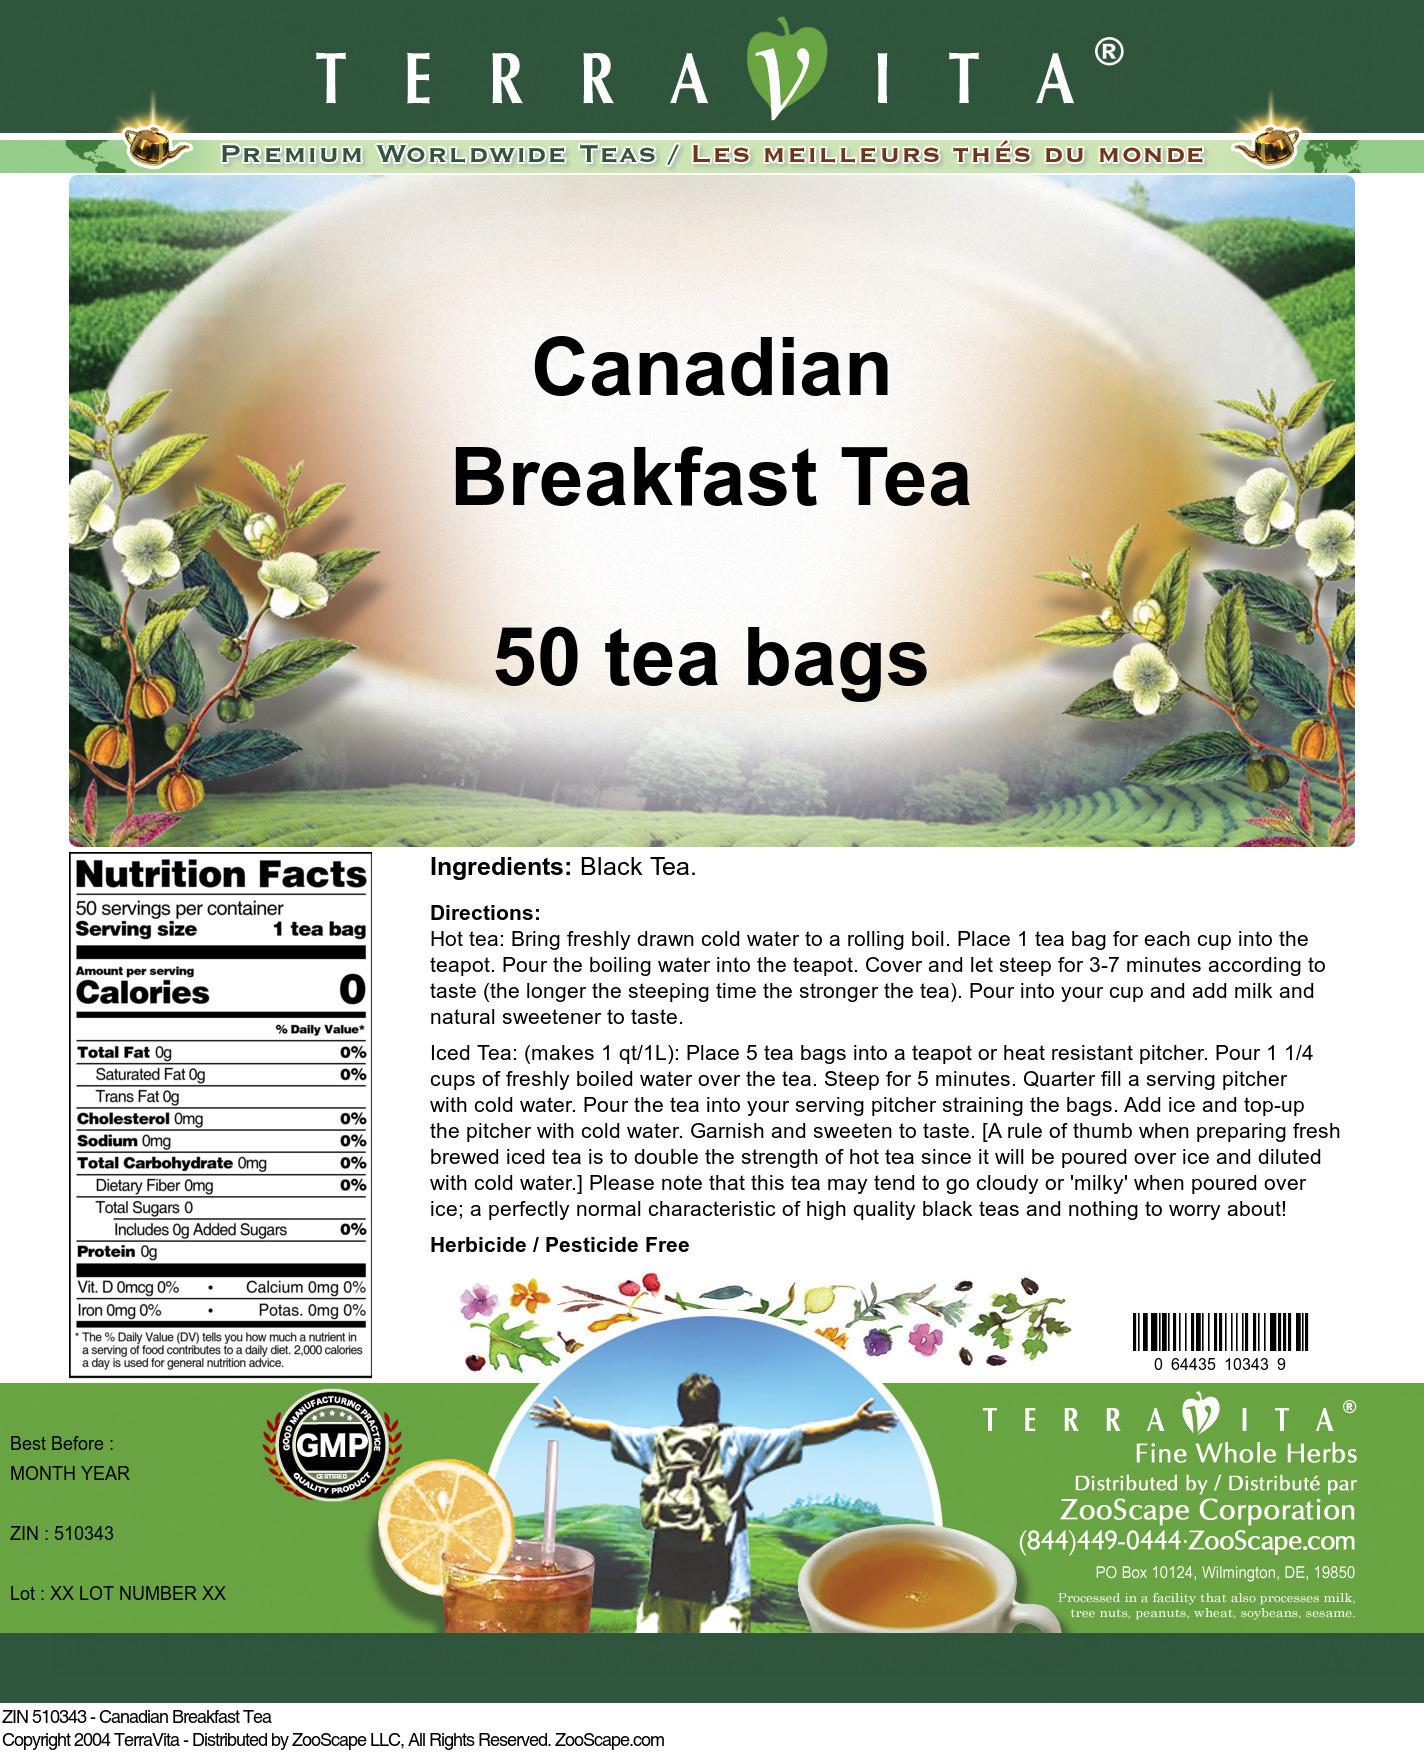 Canadian Breakfast Tea